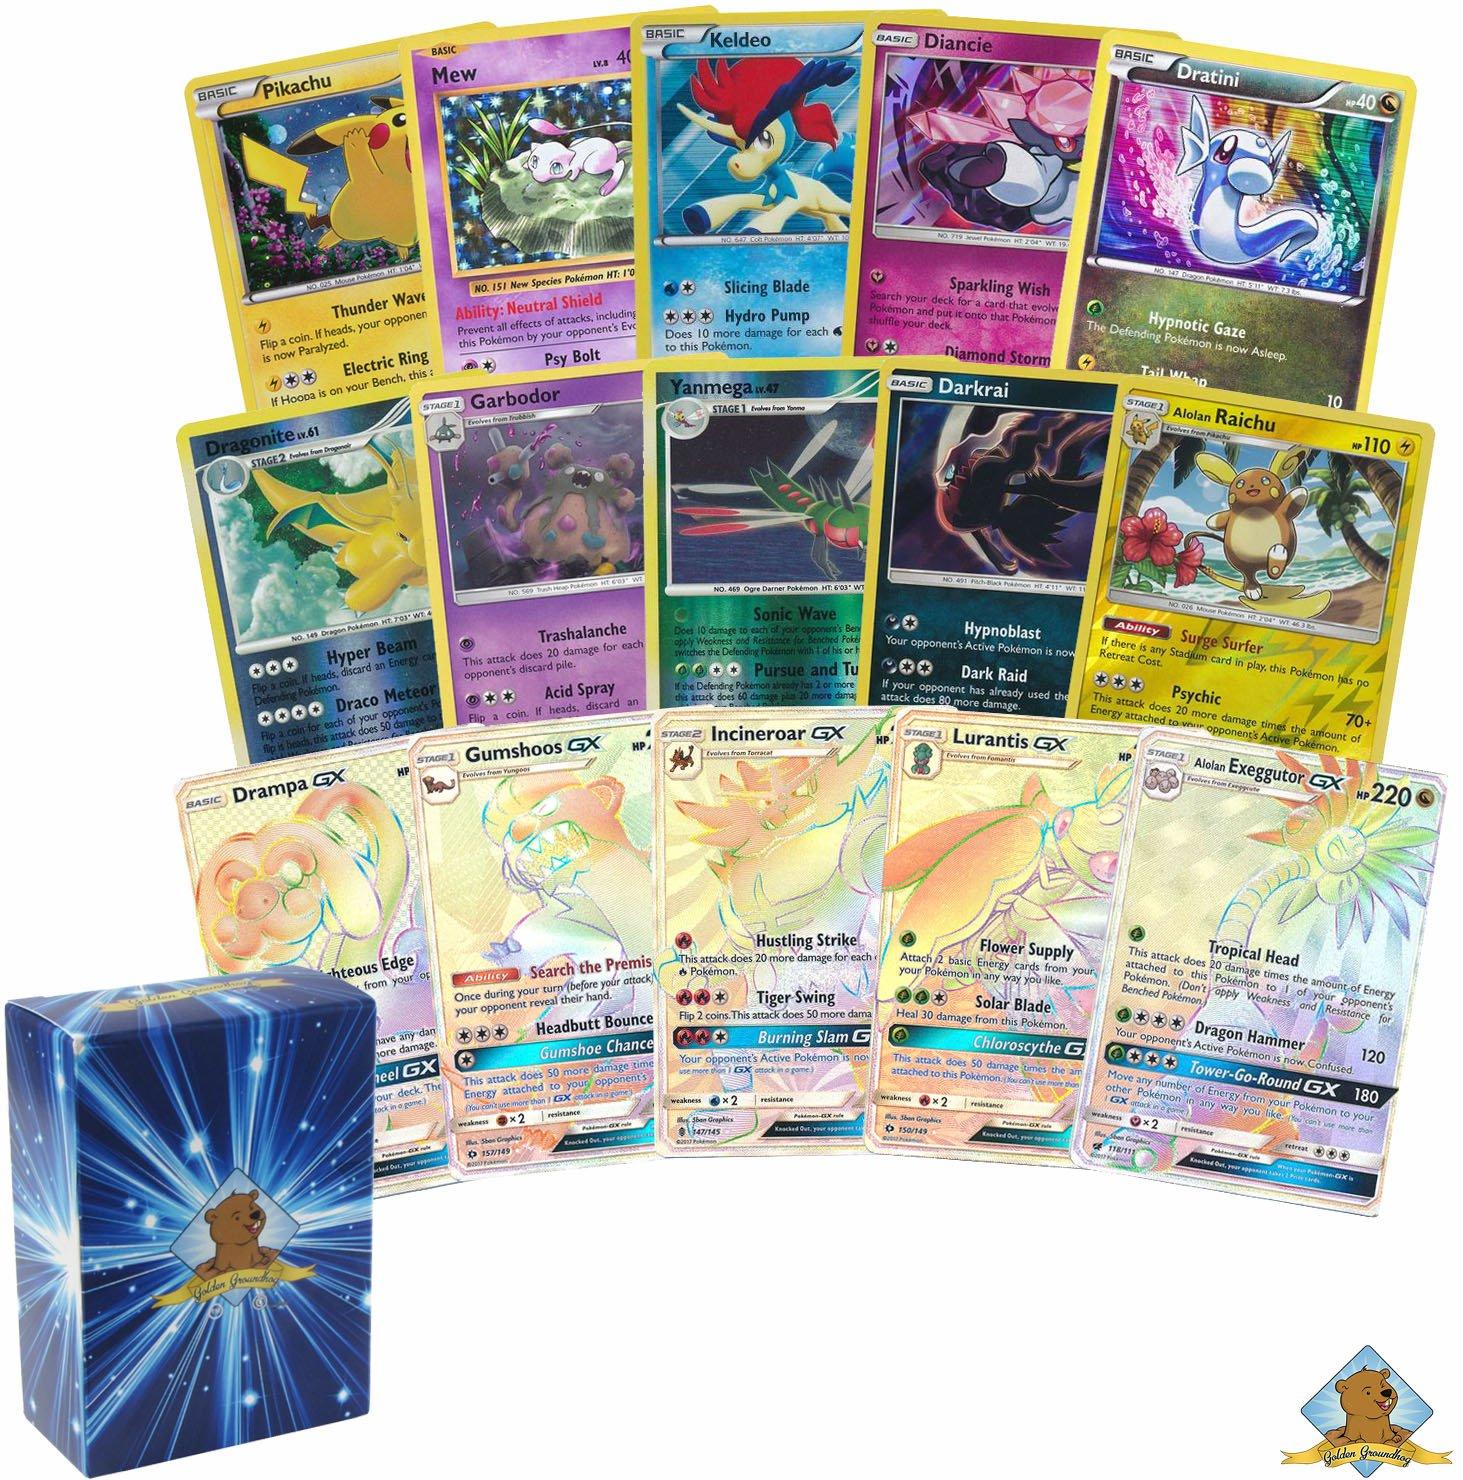 Pokemon Lot of 20 Cards - All Rares and Holos! 1 Random GX Hyper Rare! Includes Golden Groundhog Box! by GoldenGroundhog (Image #1)